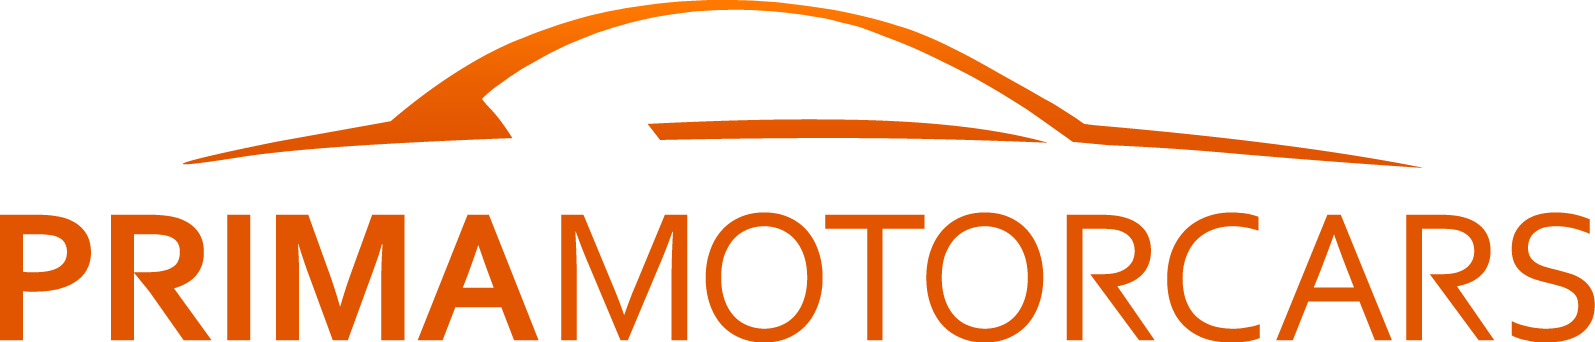 Prima Motorcars